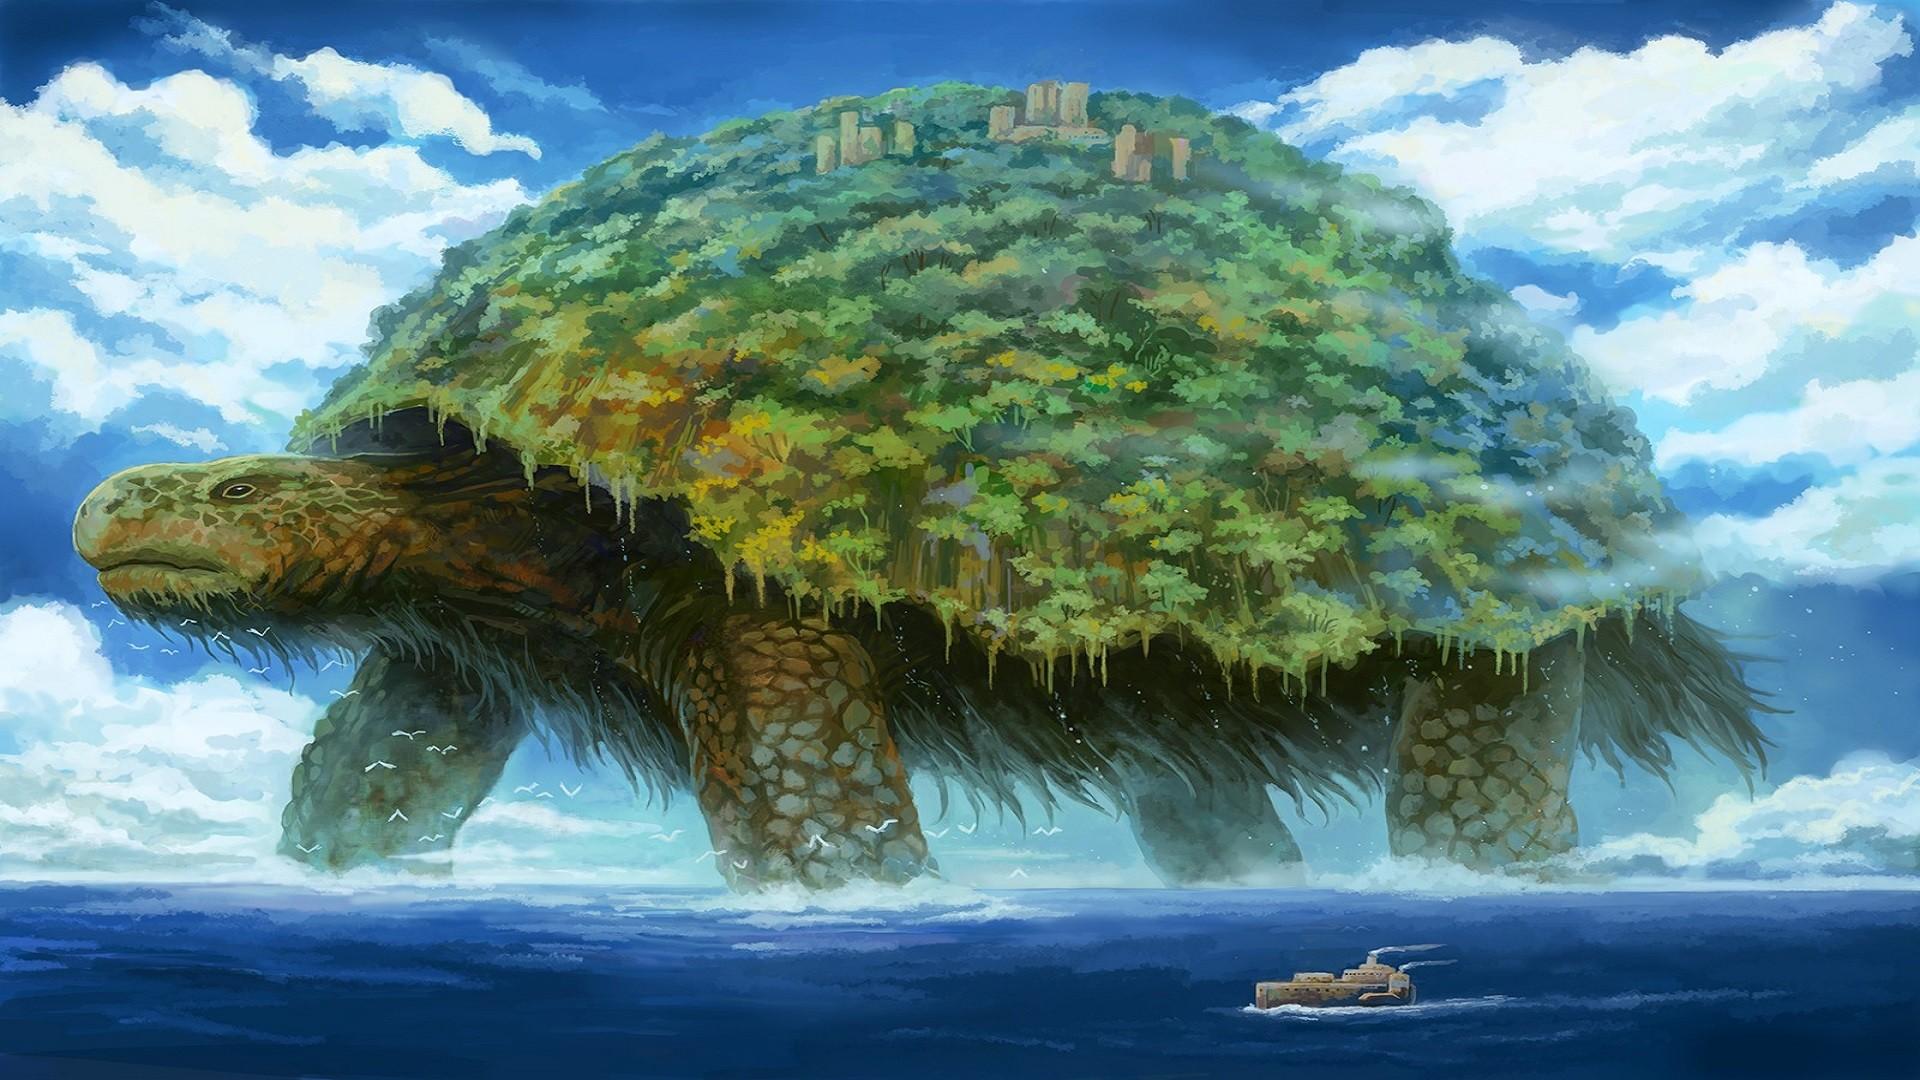 General 1920x1080 digital art nature landscape sea animals turtle trees ship forest building clouds birds giant waves artwork